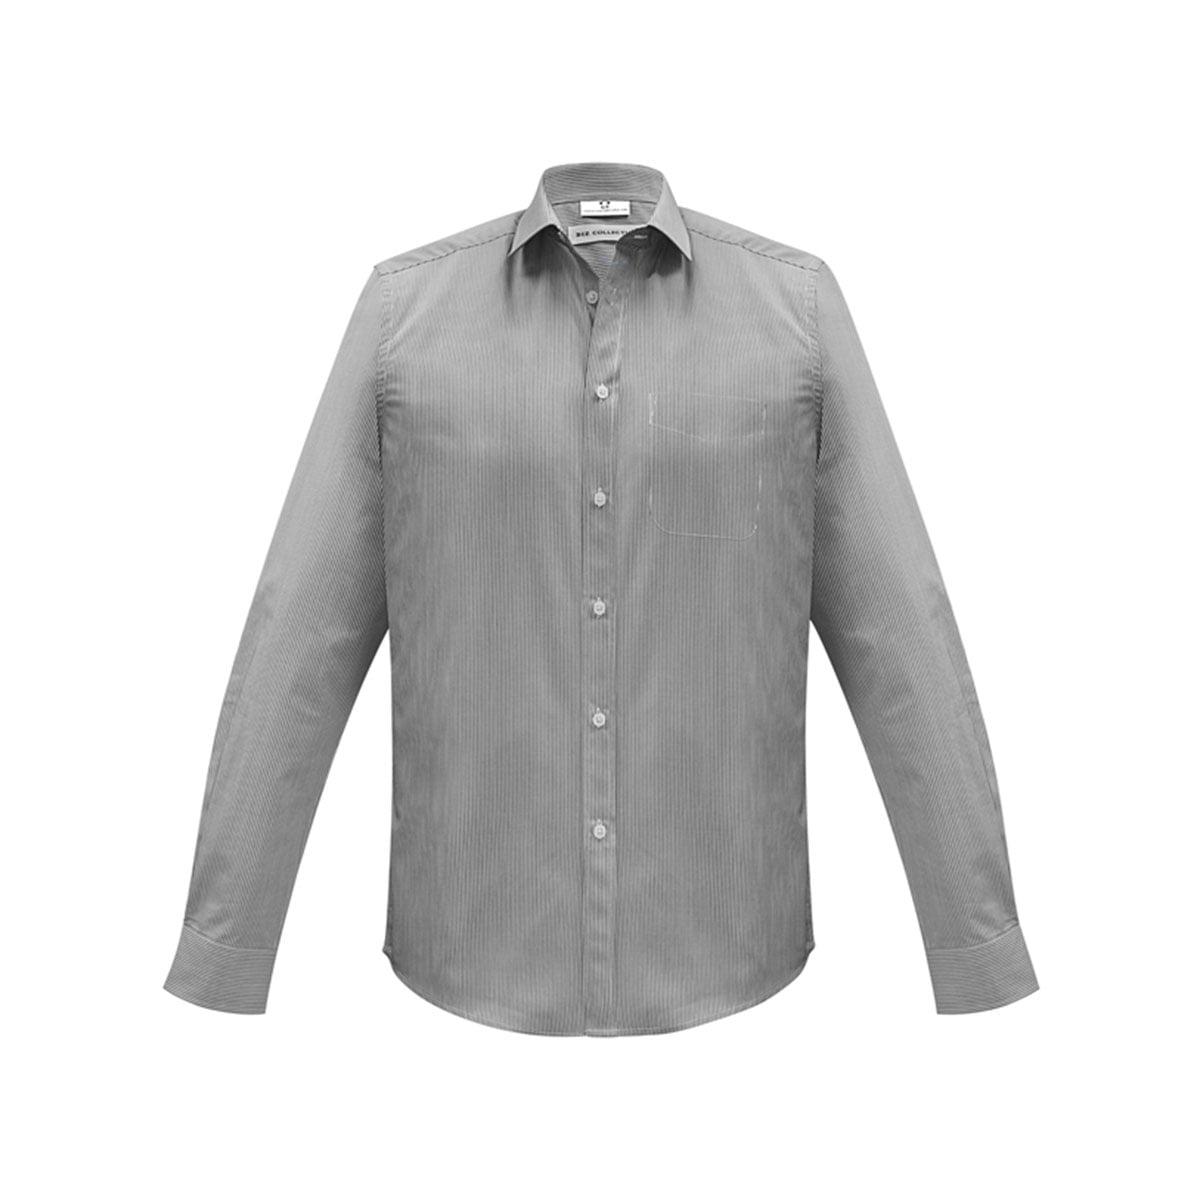 Mens Euro Long Sleeve Shirt-Black